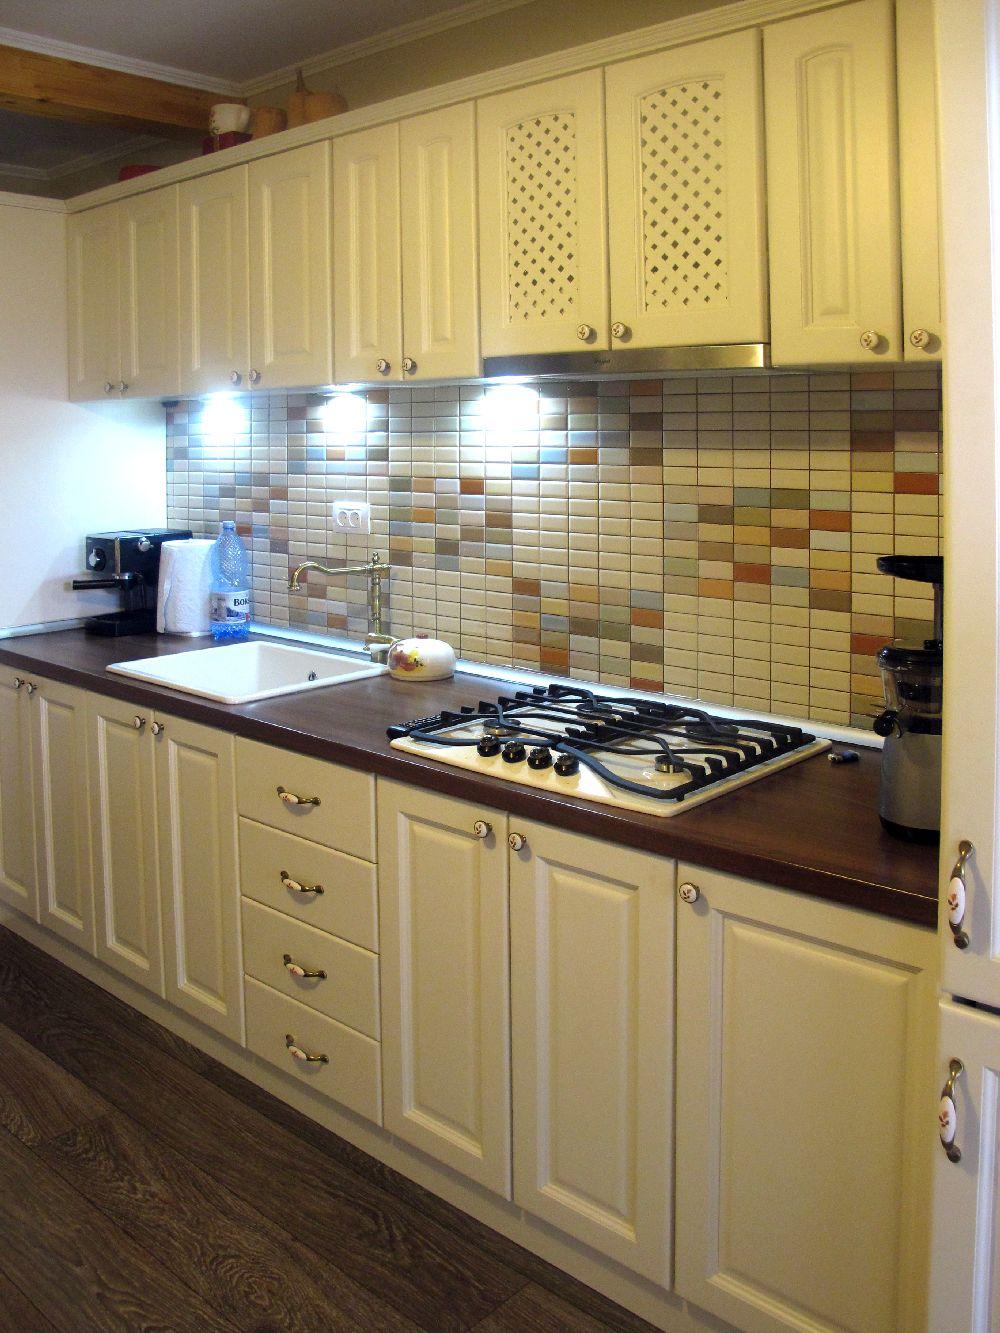 adelaparvu.com despre casa din lemn la Bacau, interior casa din lemn, design interior Mihaela Rosca, Foto, Sorin Rosca, Adela Parvu (36)